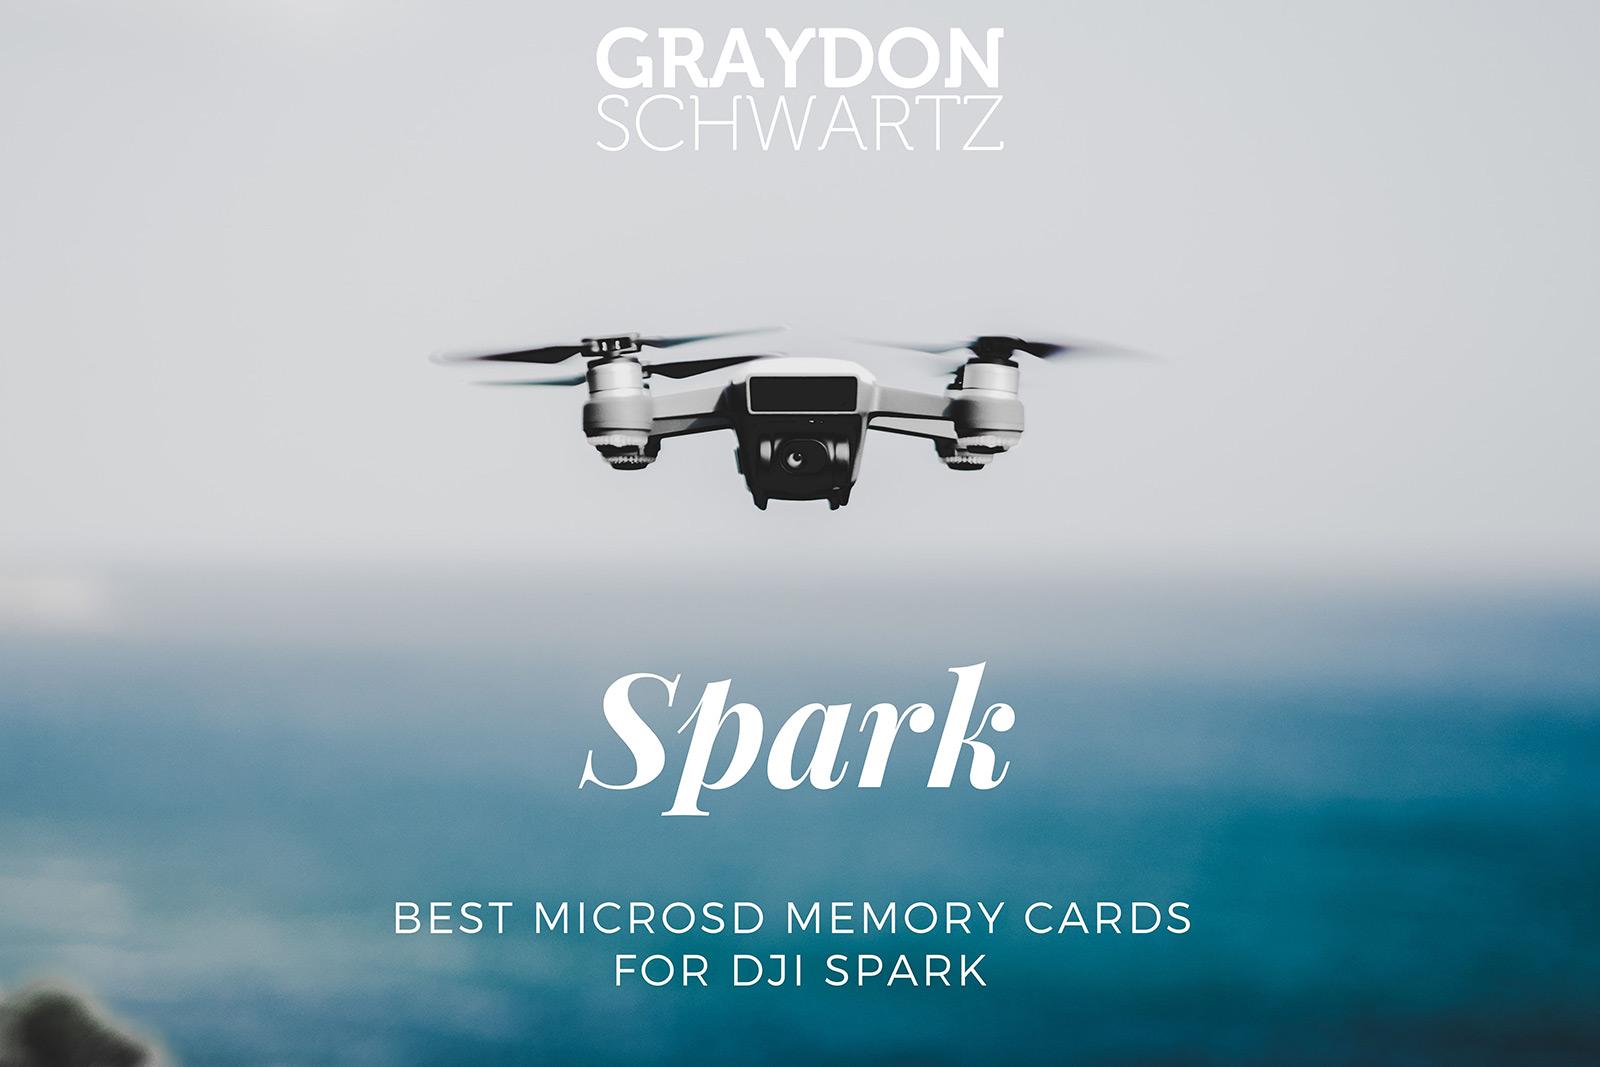 Best MicroSD Memory Cards for DJI Spark